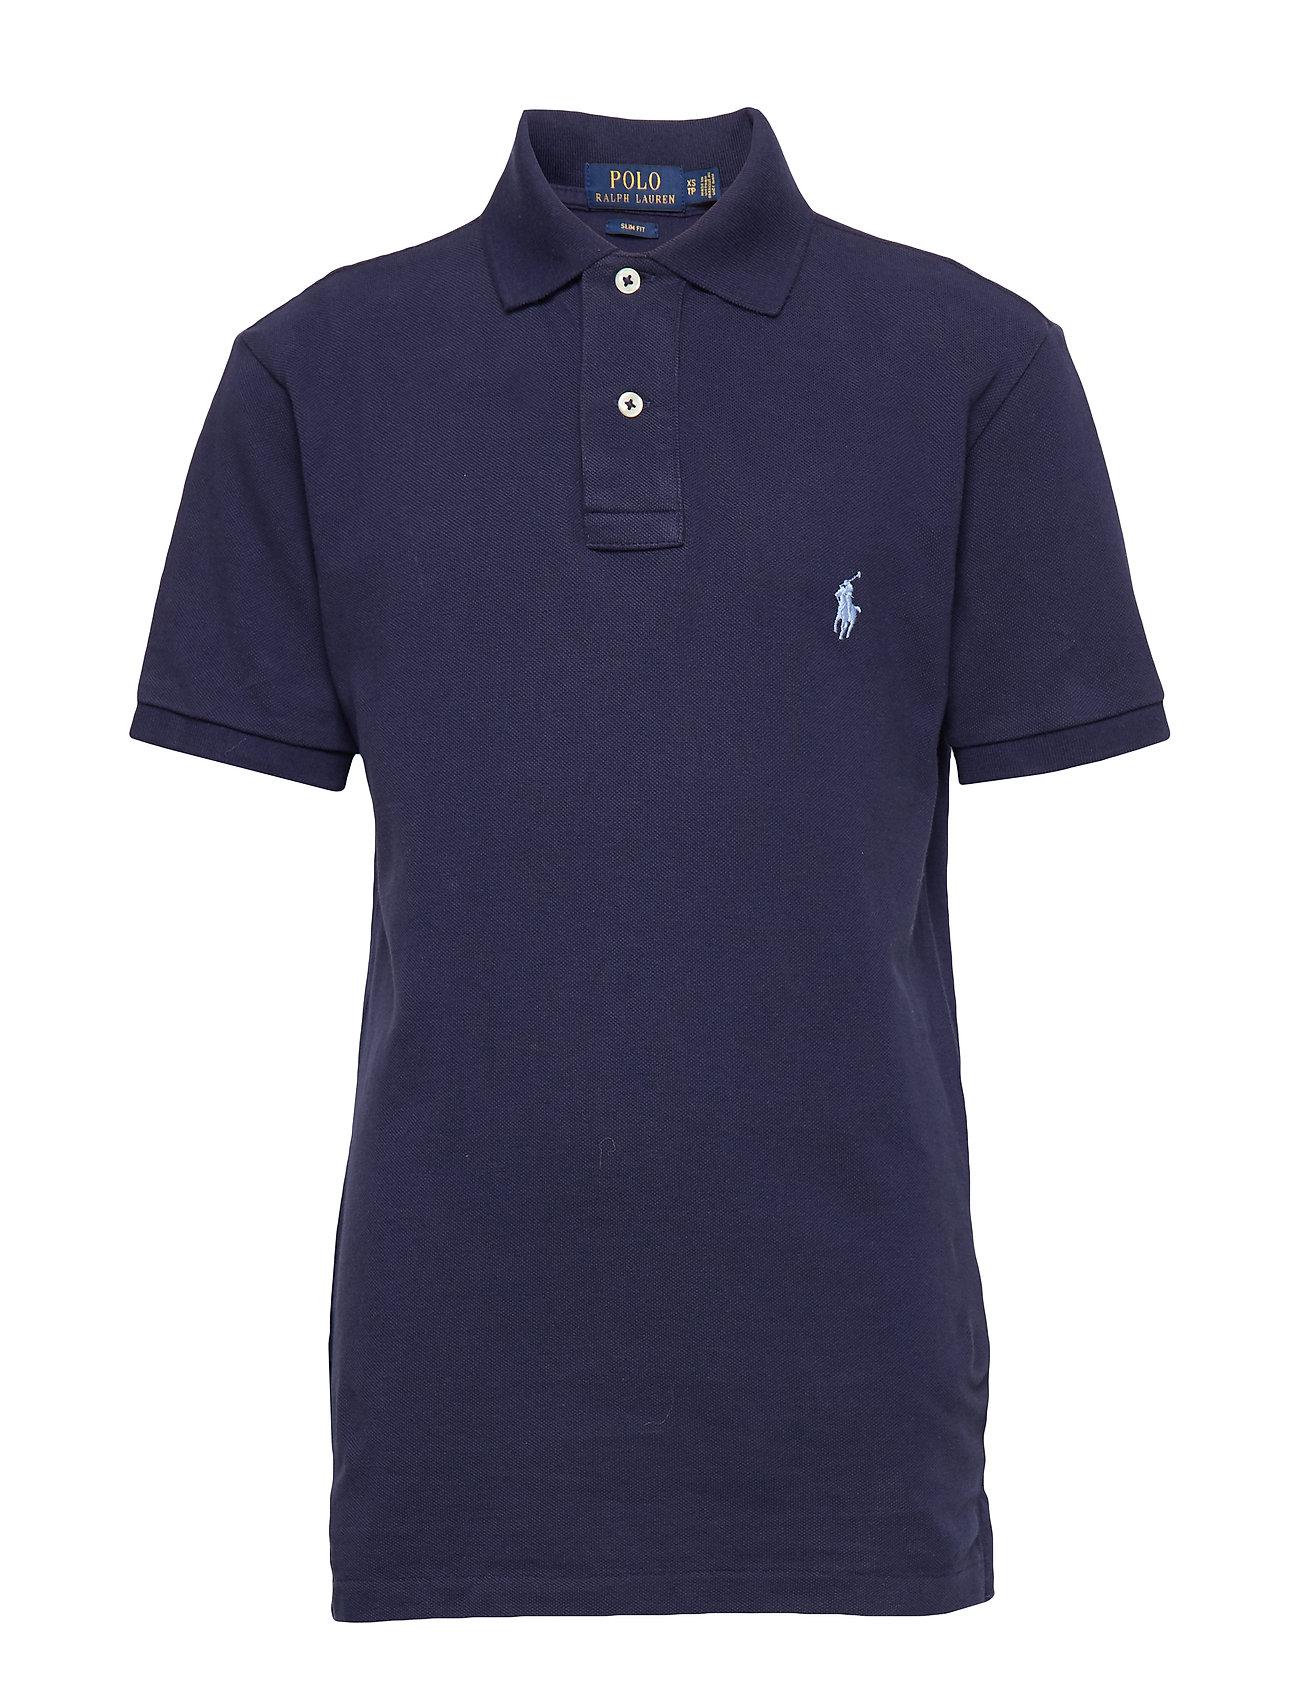 Polo Ralph Lauren Slim Fit Mesh Polo Shirt - NEWPORT NAVY/BLUE